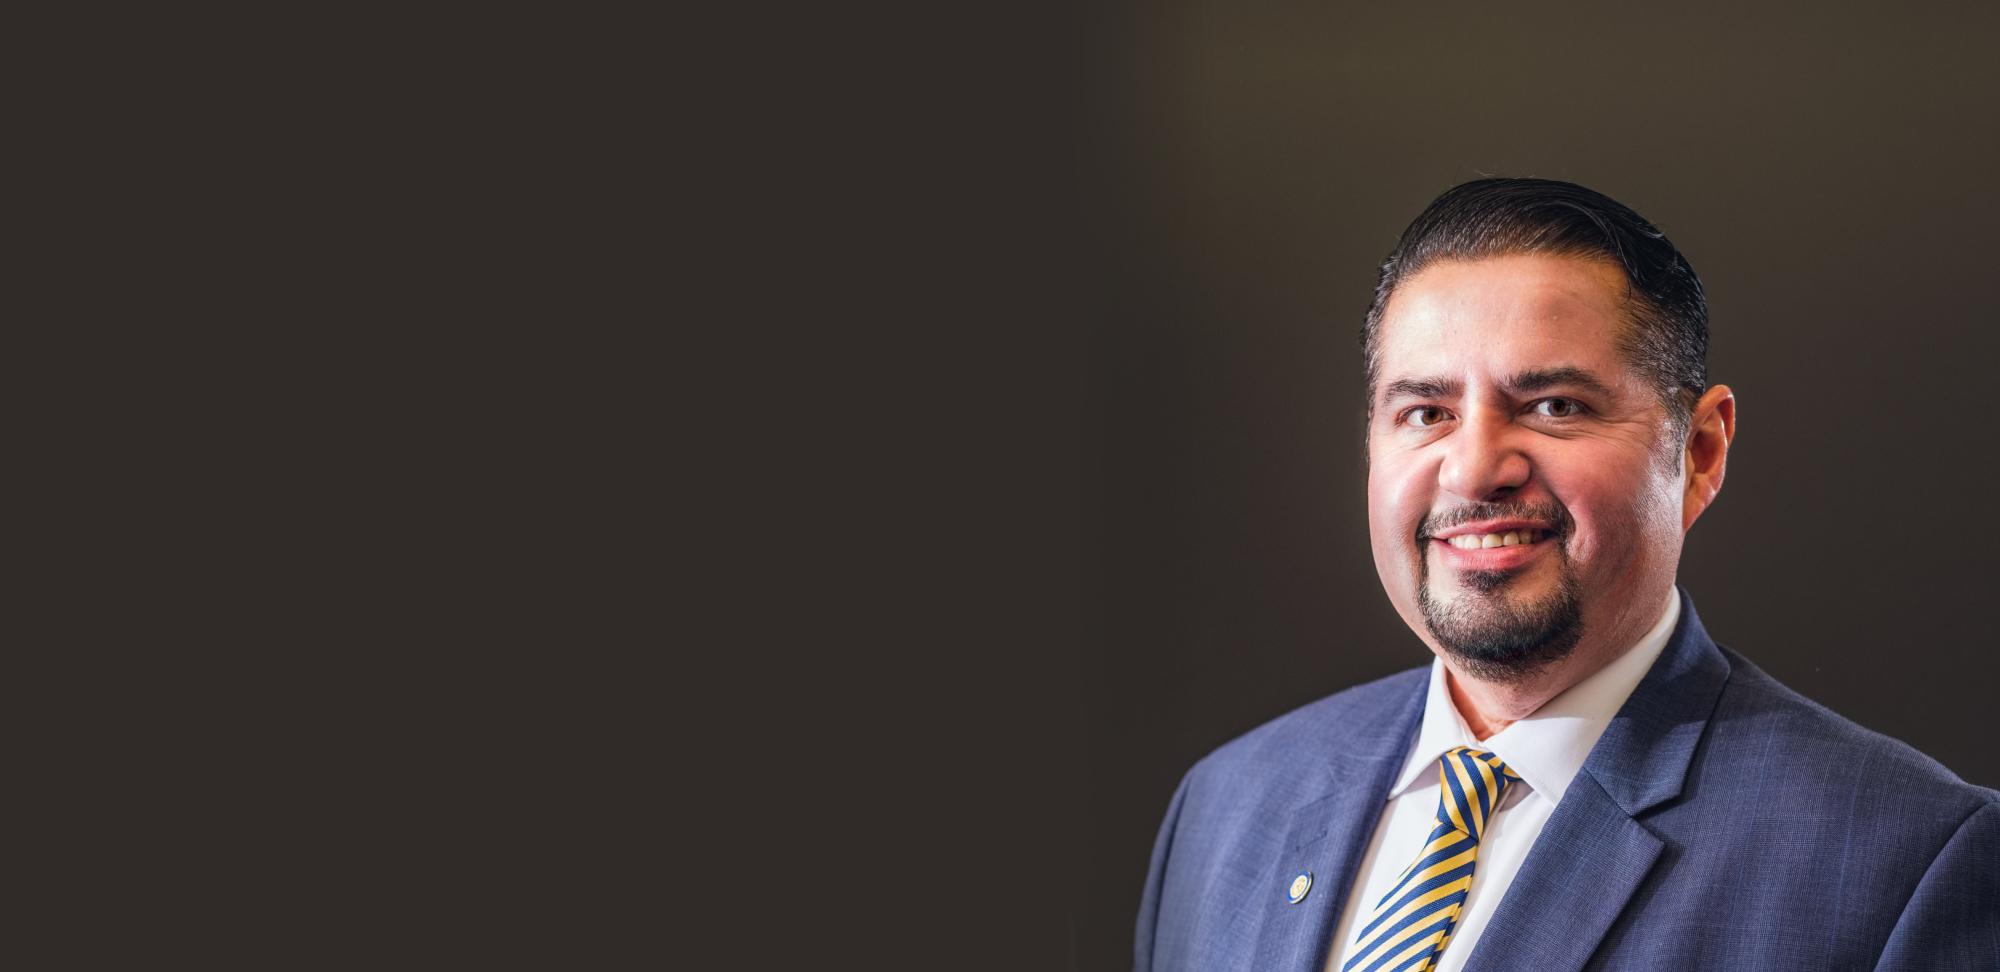 Attorney Joe Flores smiling wearing suite